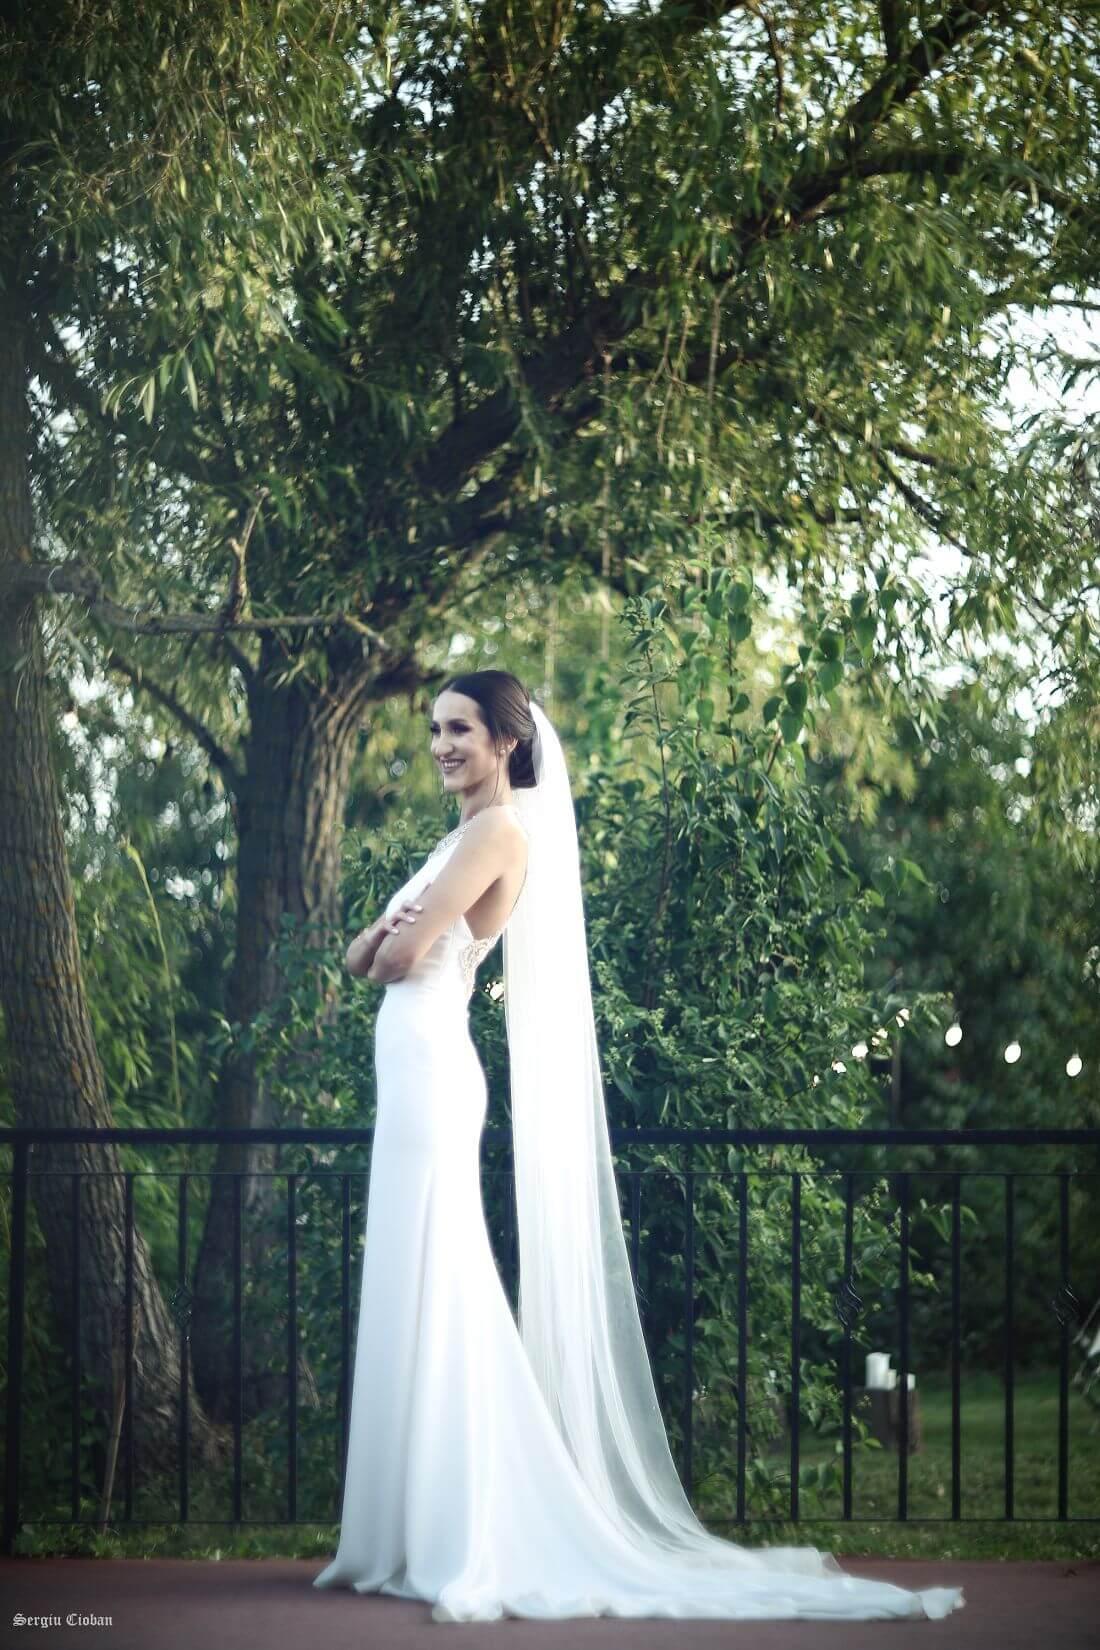 Iulia & Ludovic - IV- Sergiu Cioban - IDO-Weddings-nuntiinaerliber (9)